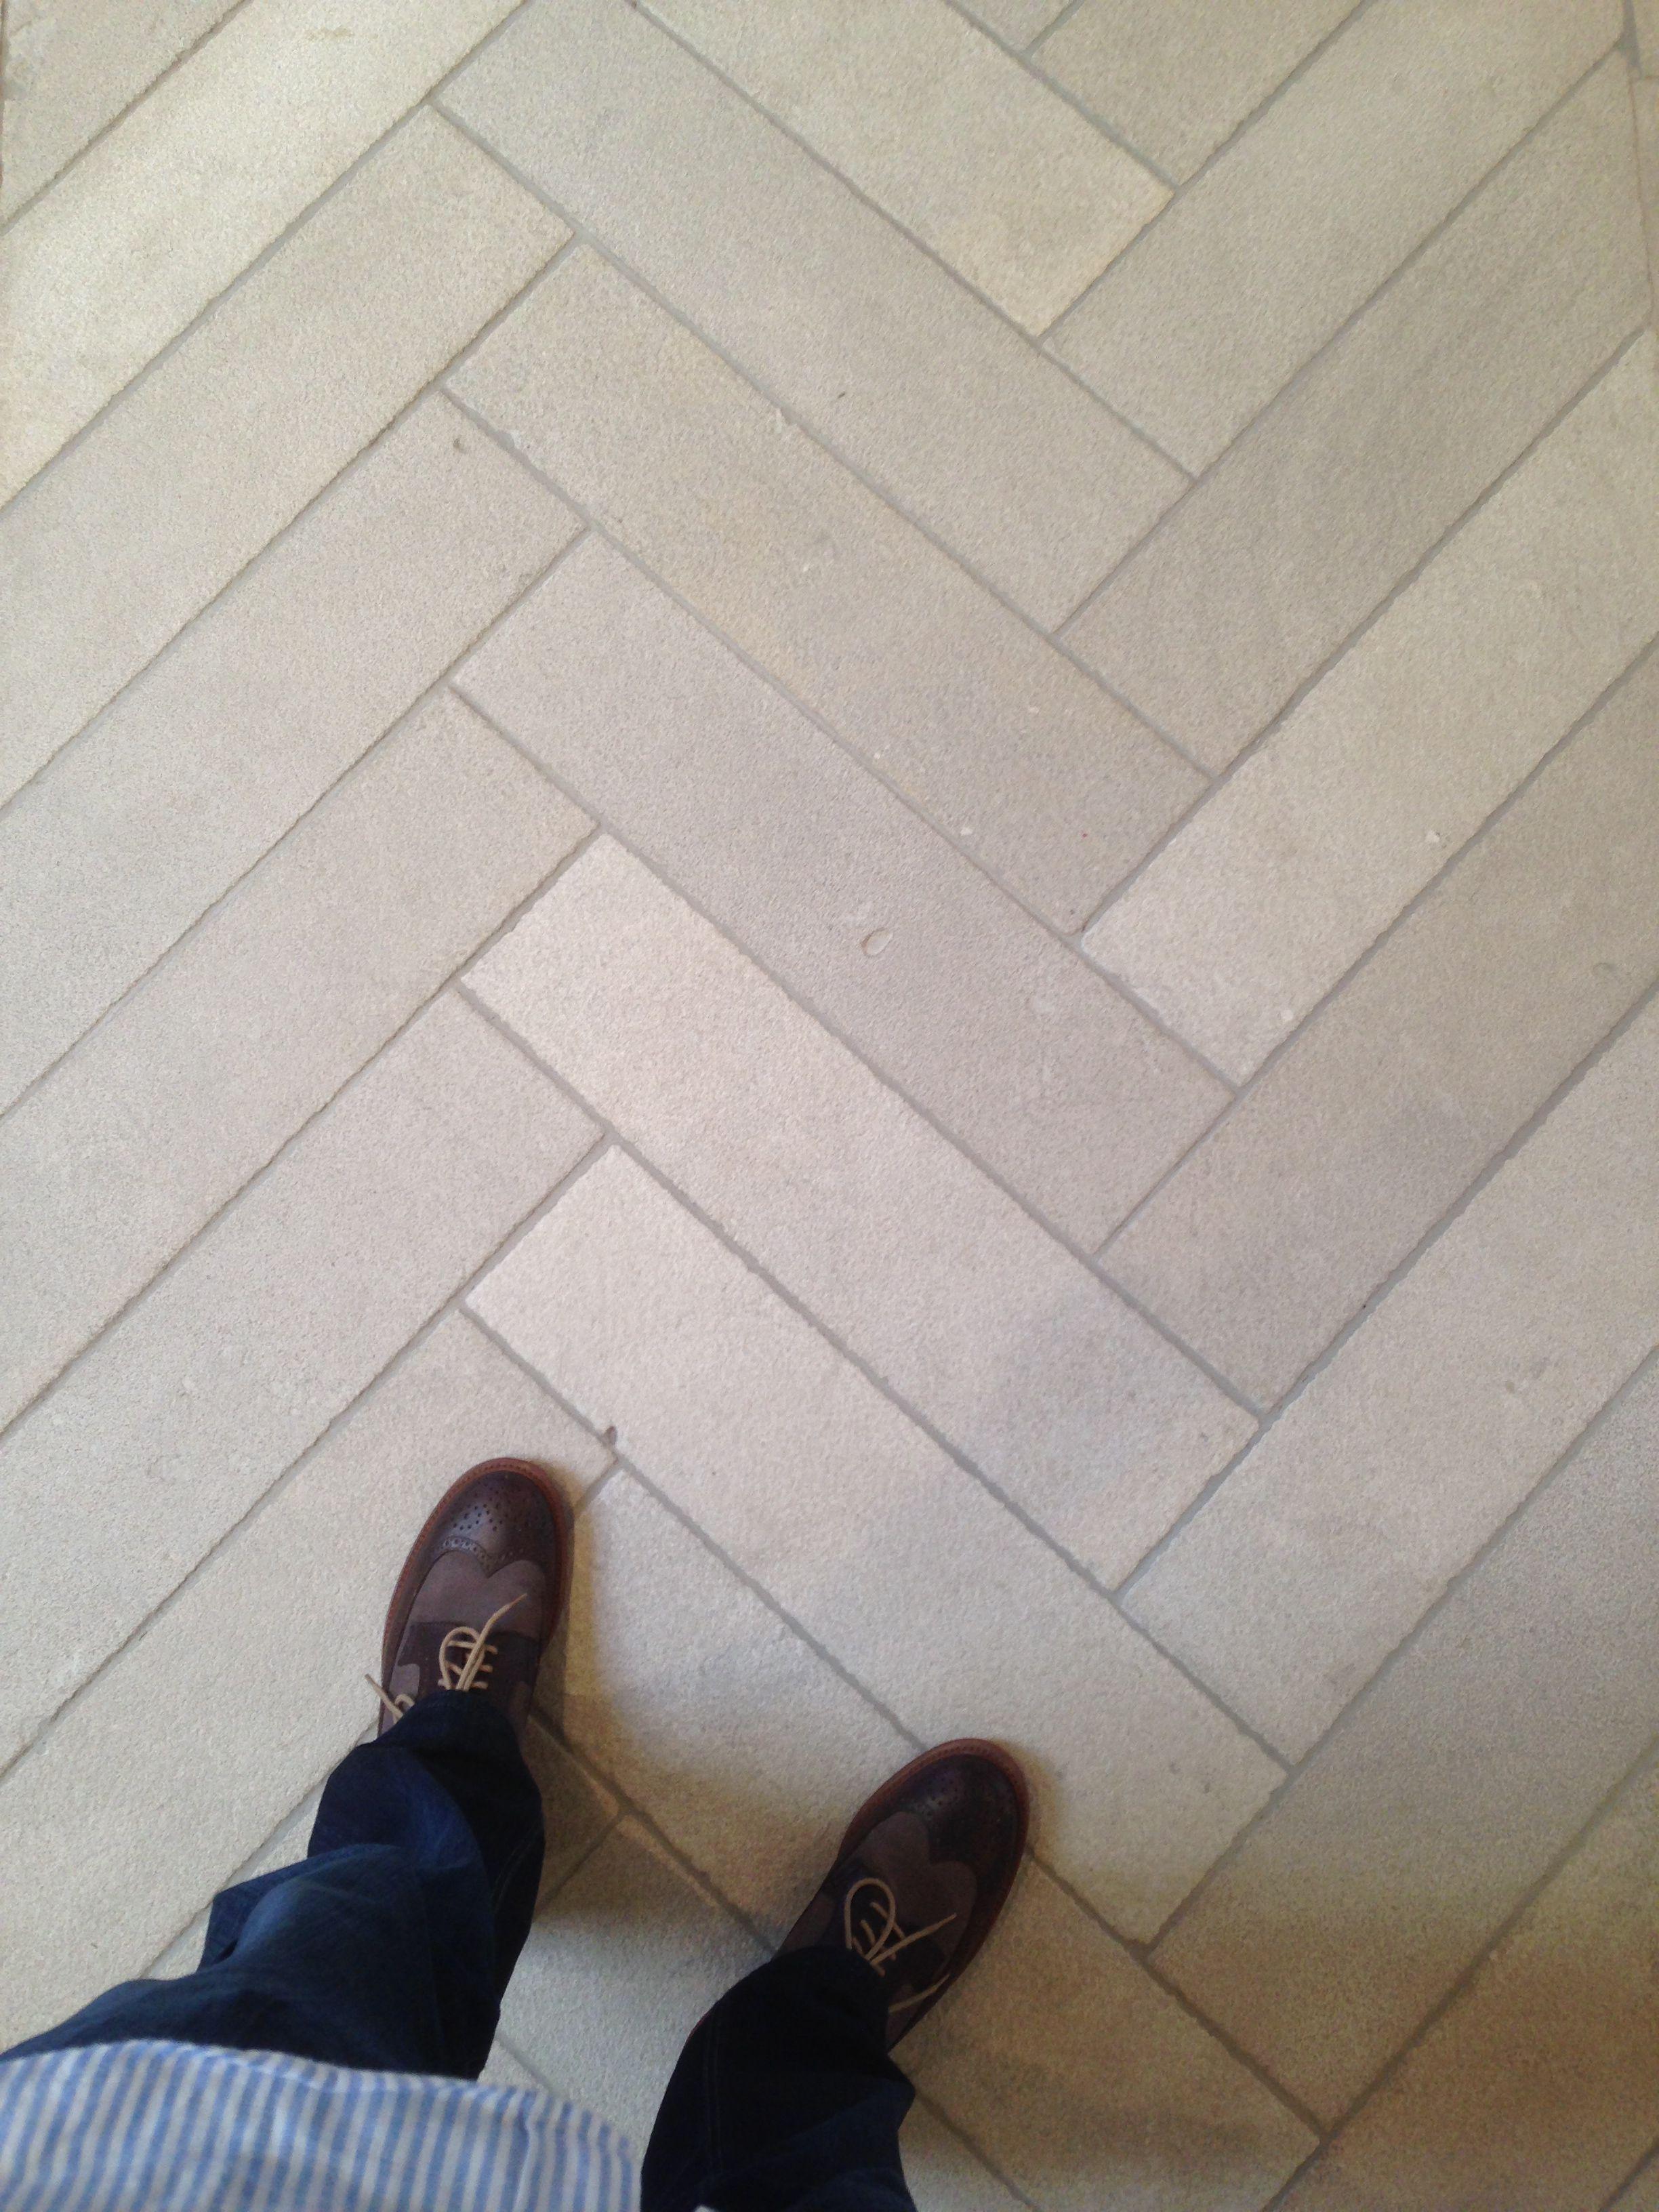 Iron Blasted Dalle De France Branly Limestone Floors In